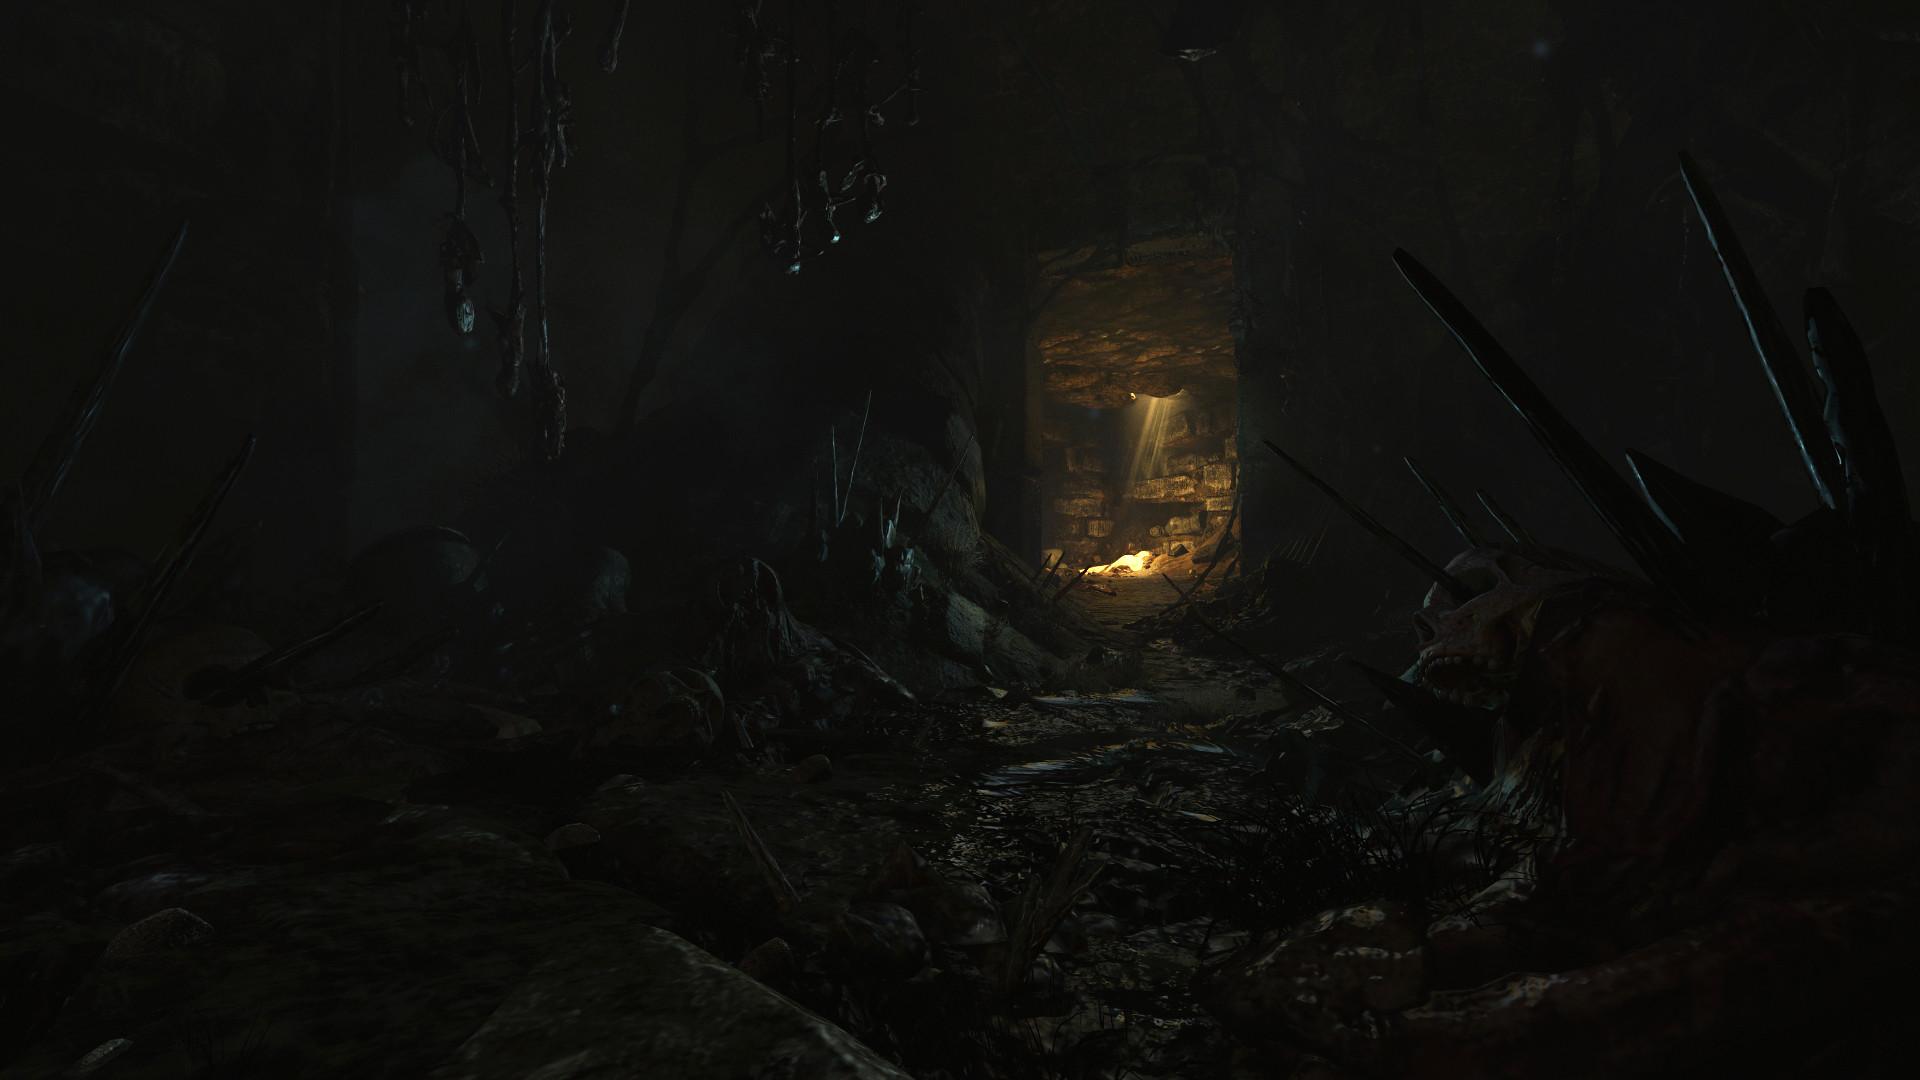 49626734602 76c239a32a k - Frictional Games enthüllt die Horror-Fortsetzung Amnesia: Rebirth